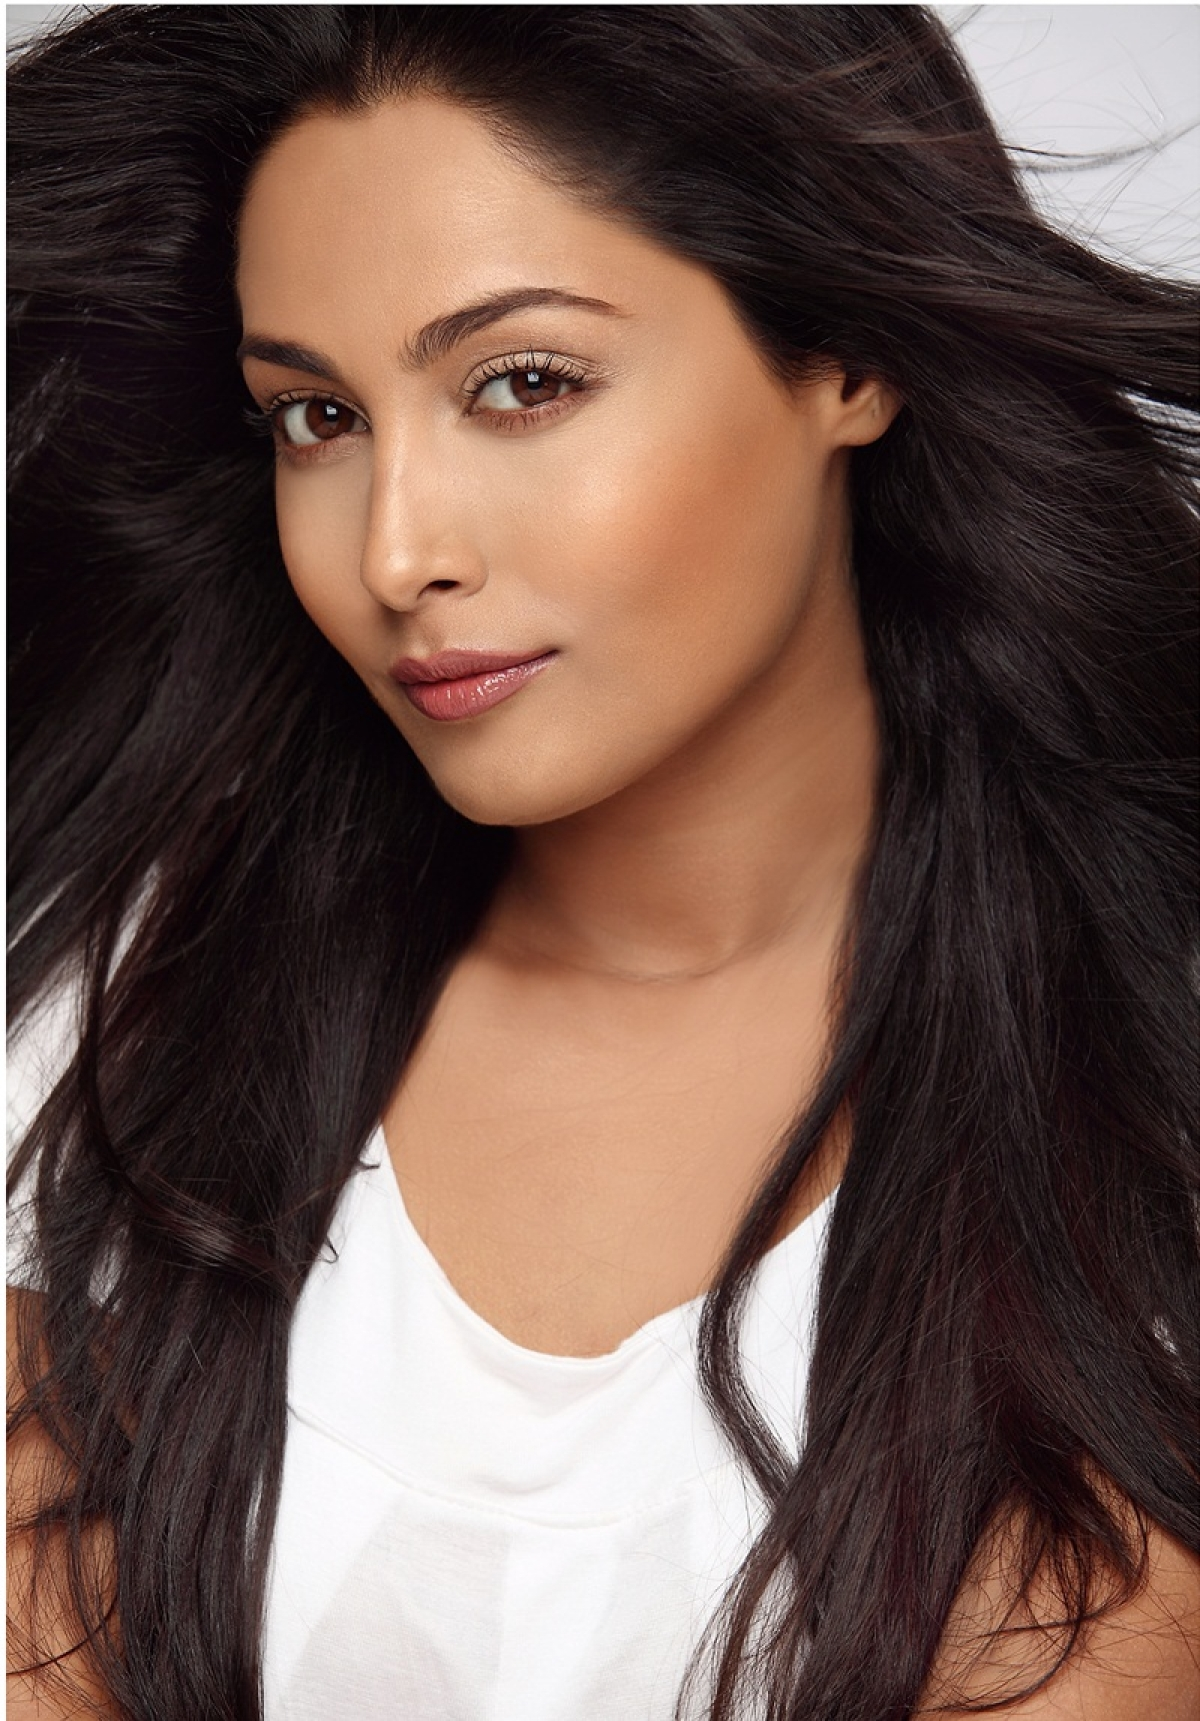 I am so happy to be a part of Shani, says Snigdha A Akolkar